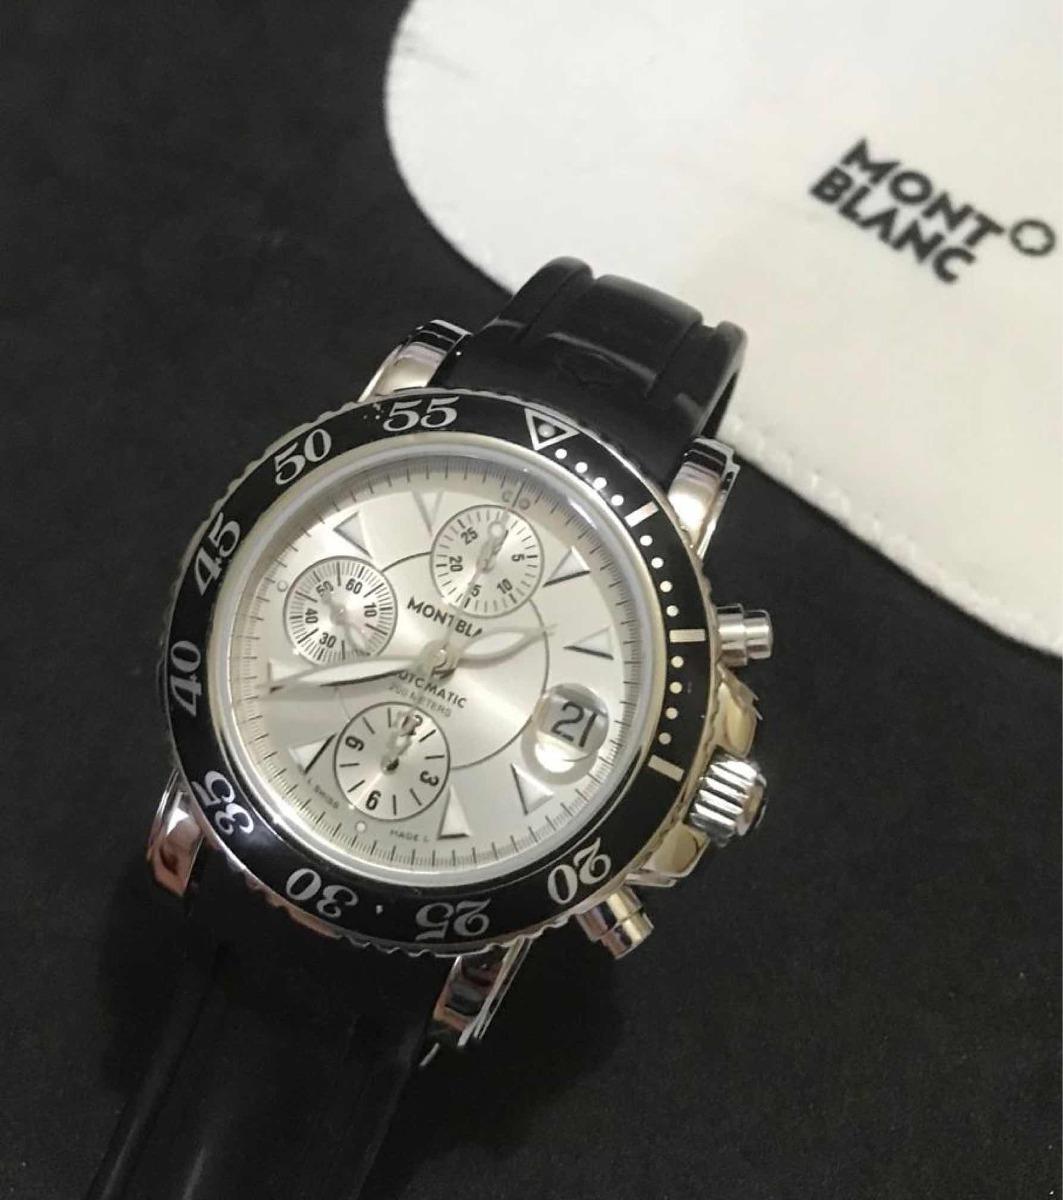 6d83ae20998 Relógio Montblanc Revisado Nota Fiscal Sport Mont Blanc 42mm - R ...